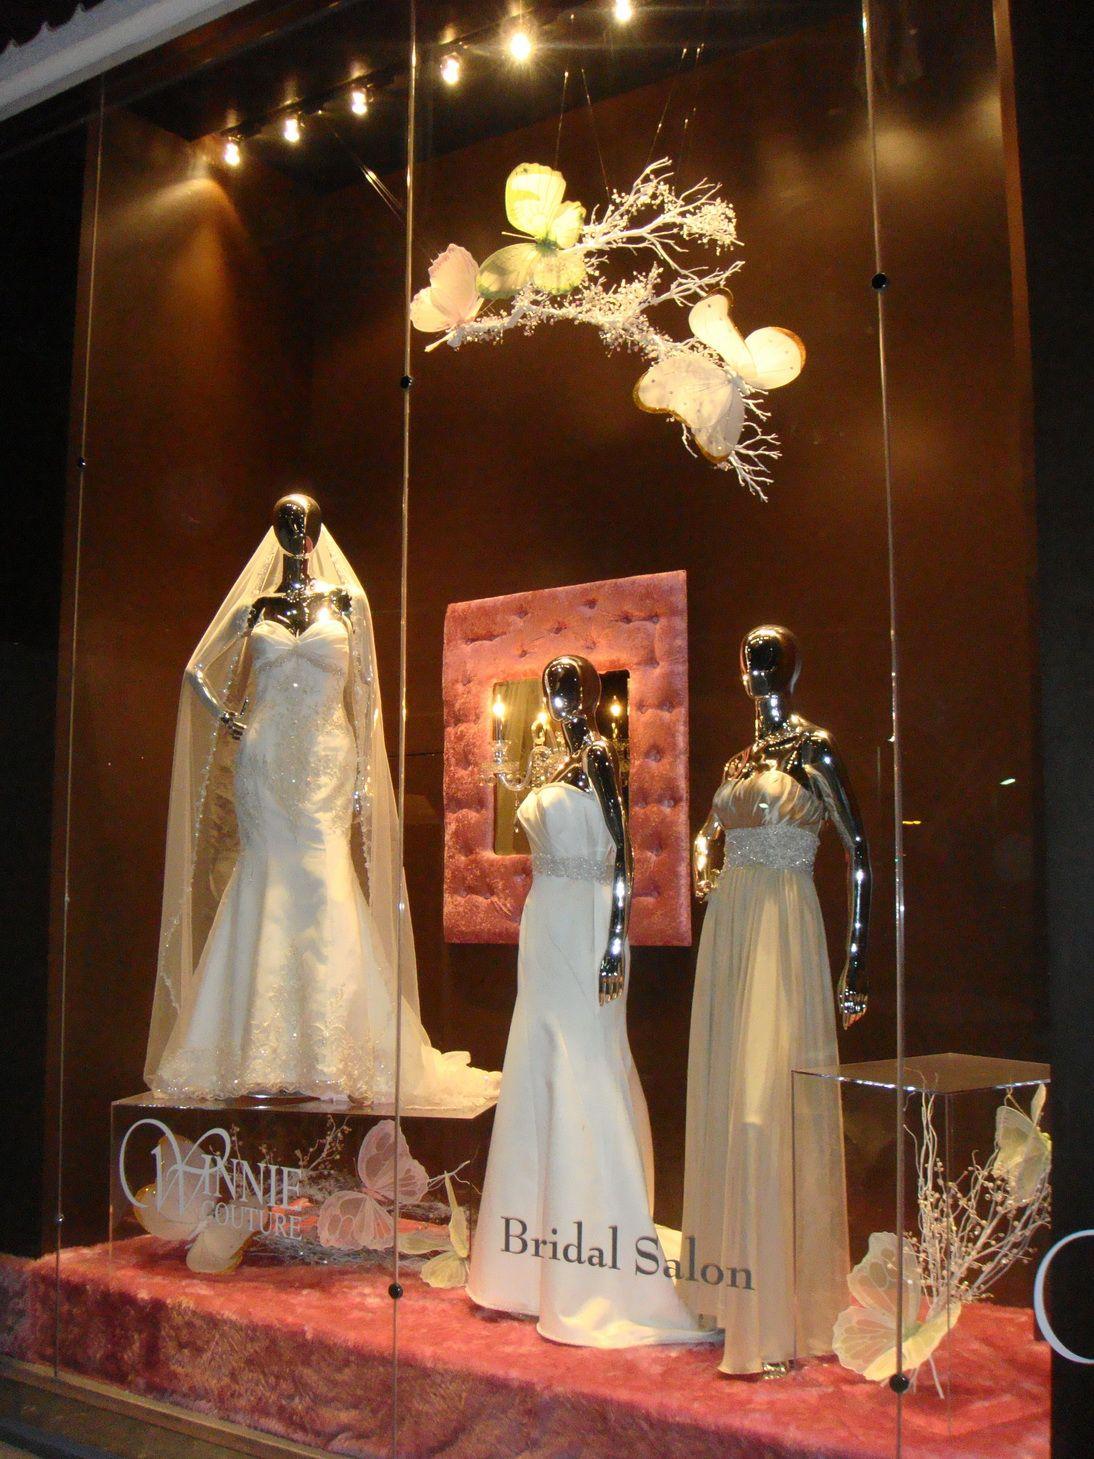 Winnie couture flagship bridal salon window display windows